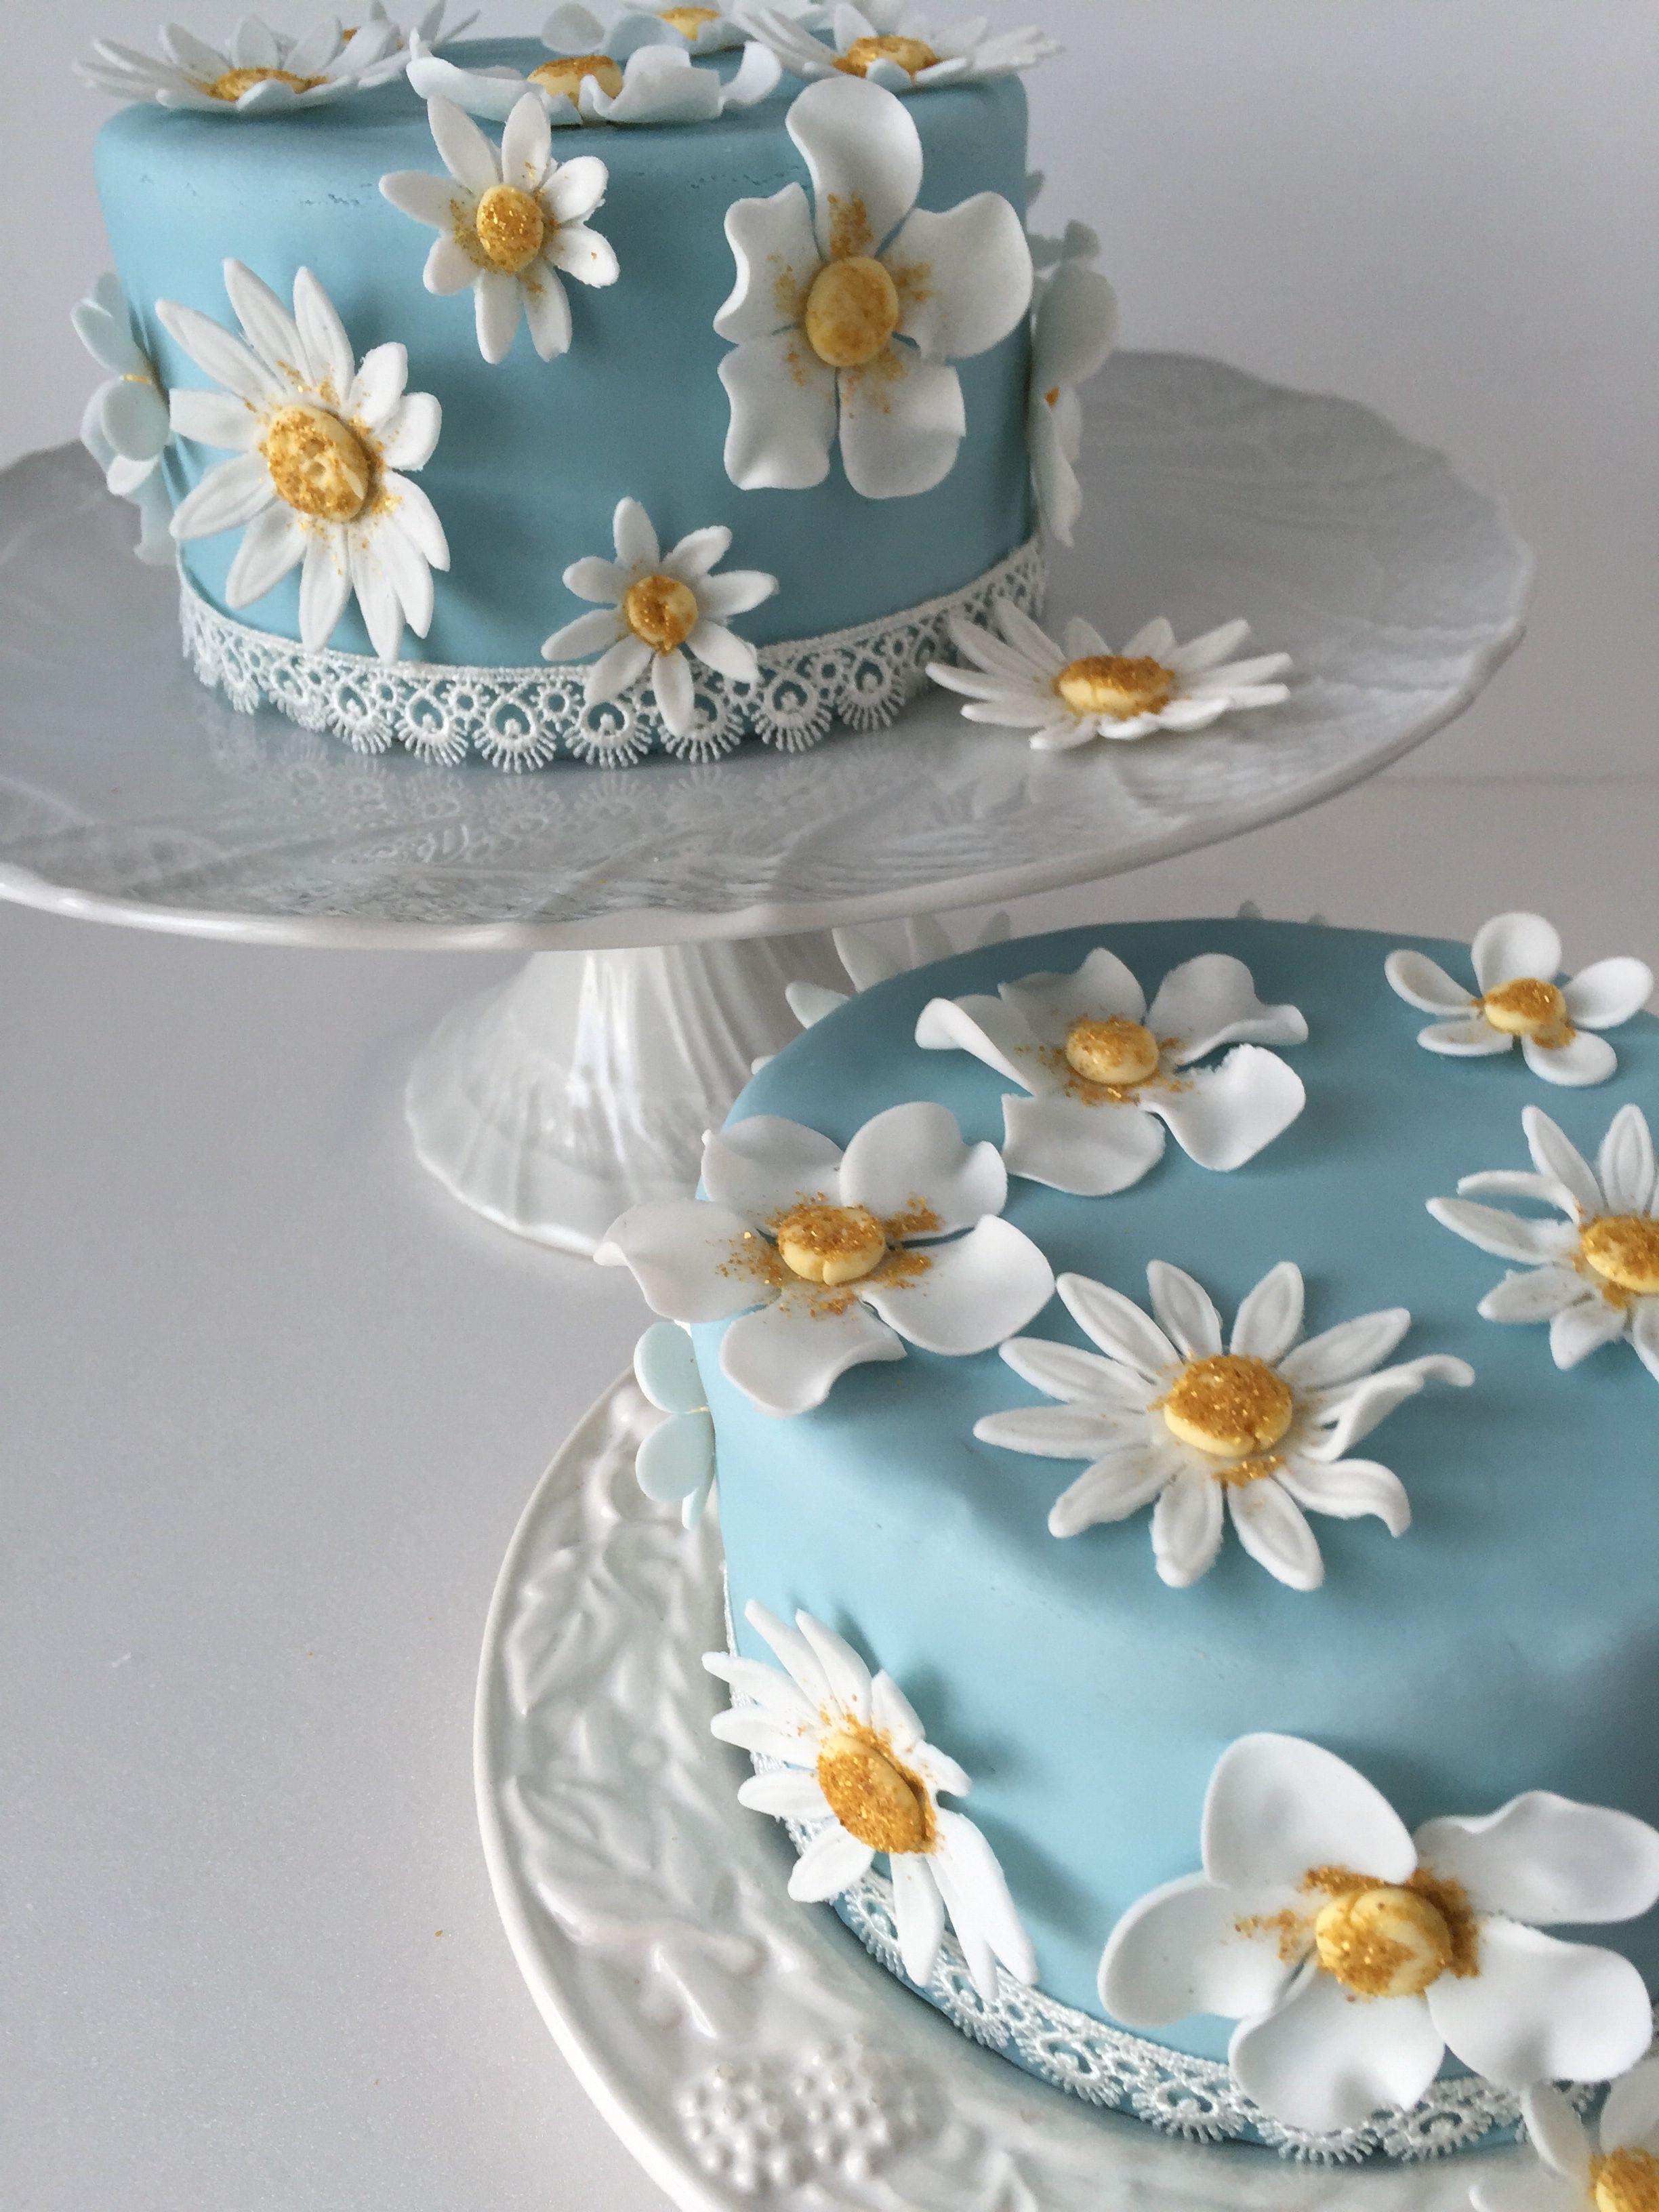 Daisy cake | Cake decorating, Daisy cakes, Cake